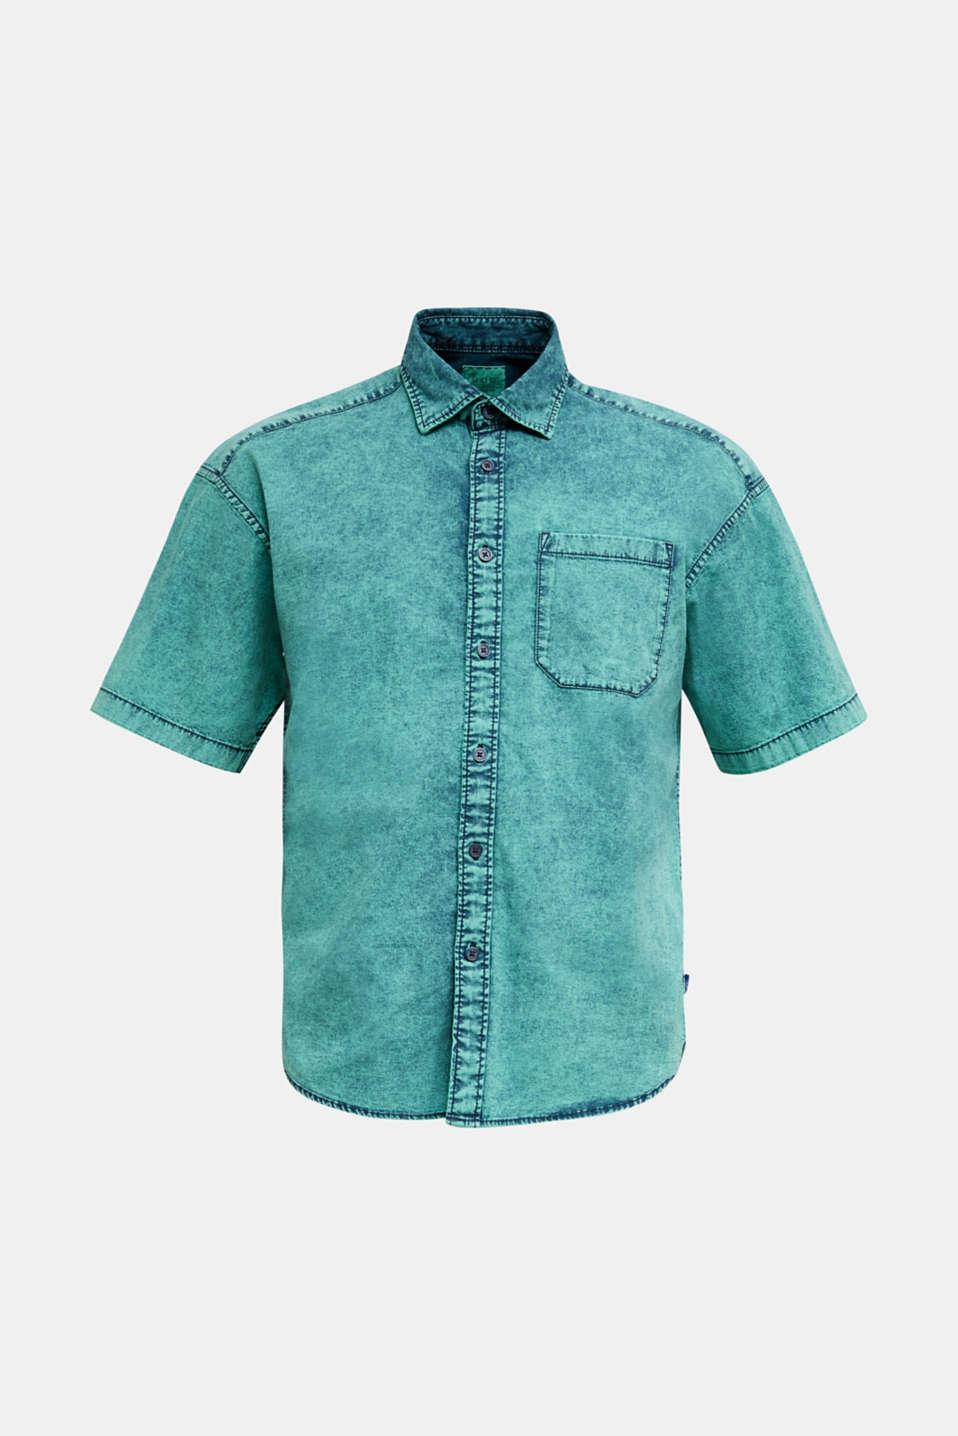 Shirt in a vintage look, BOTTLE GREEN 5, detail image number 6